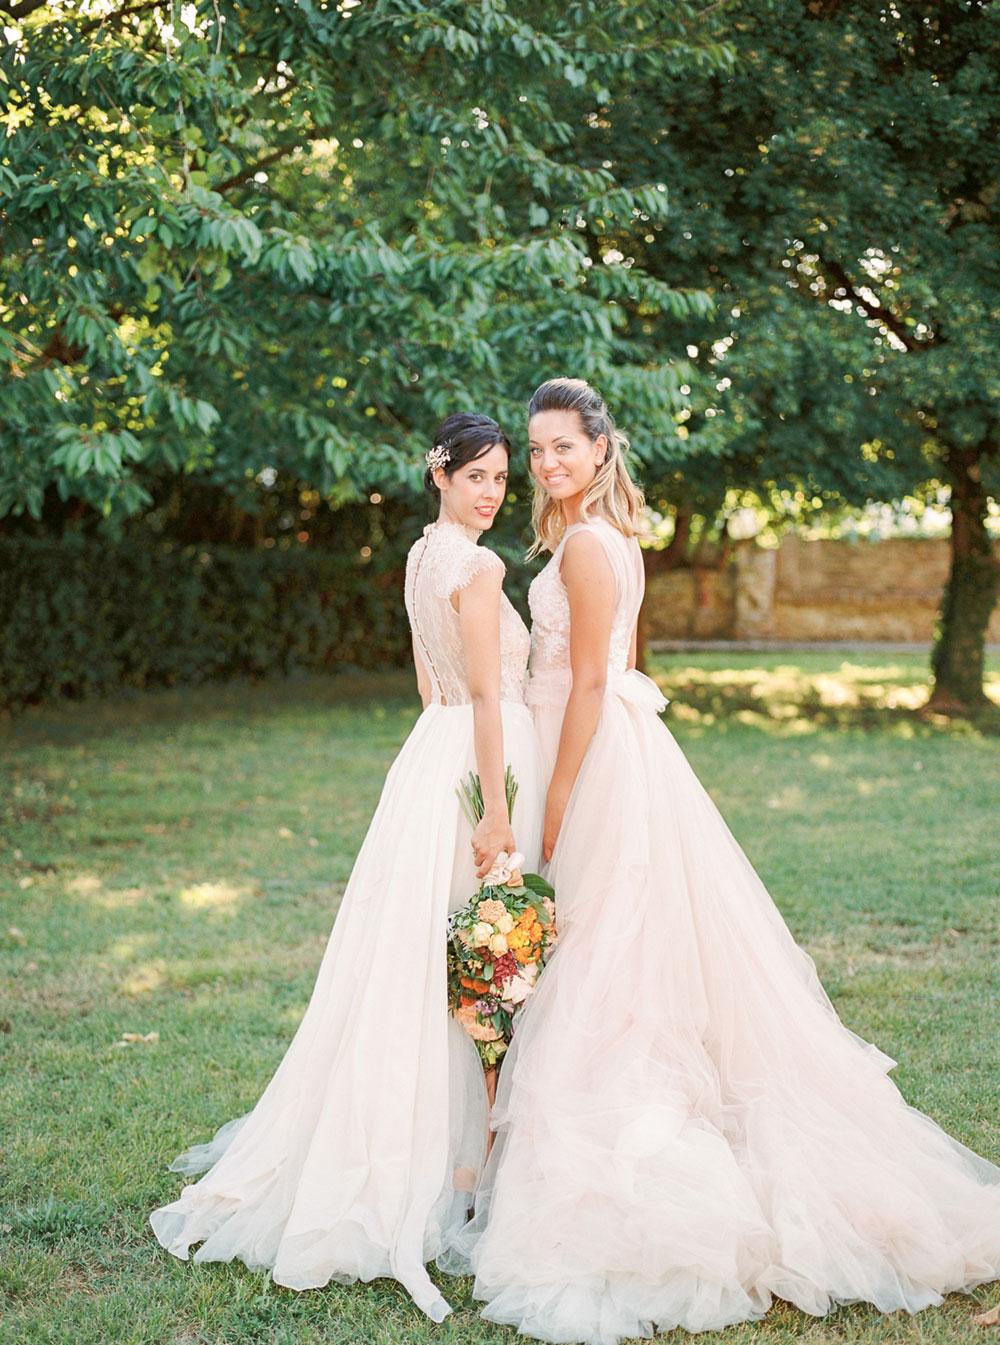 Linari-Tuscany-Elopement-Courtney-Michaela-260